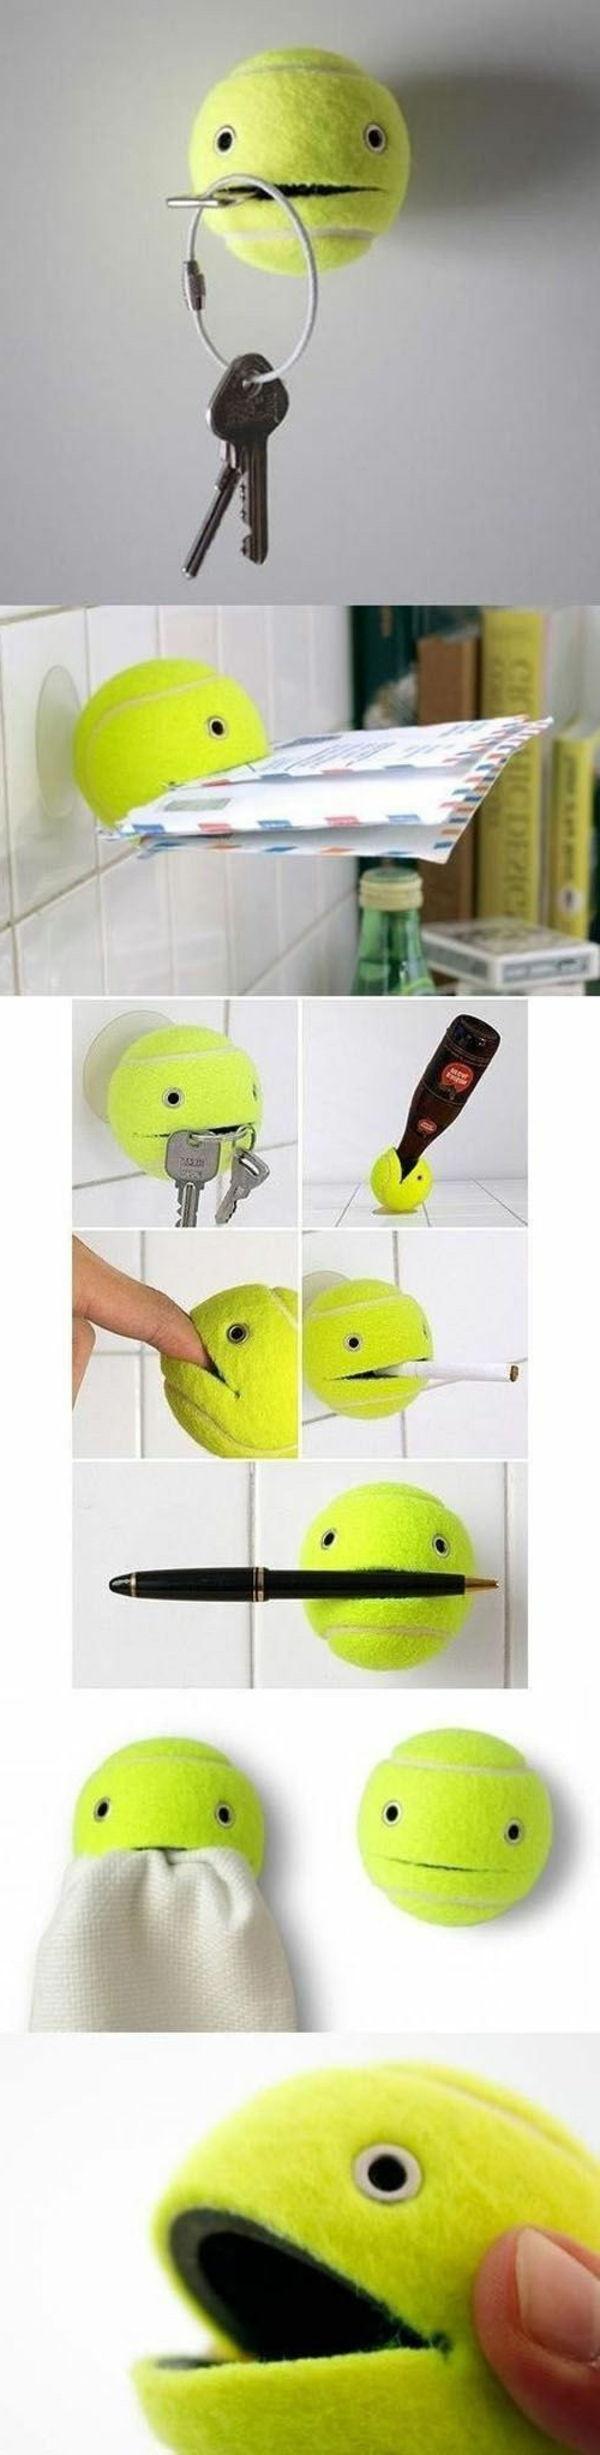 einfache bastelideen tennis ball benutzen